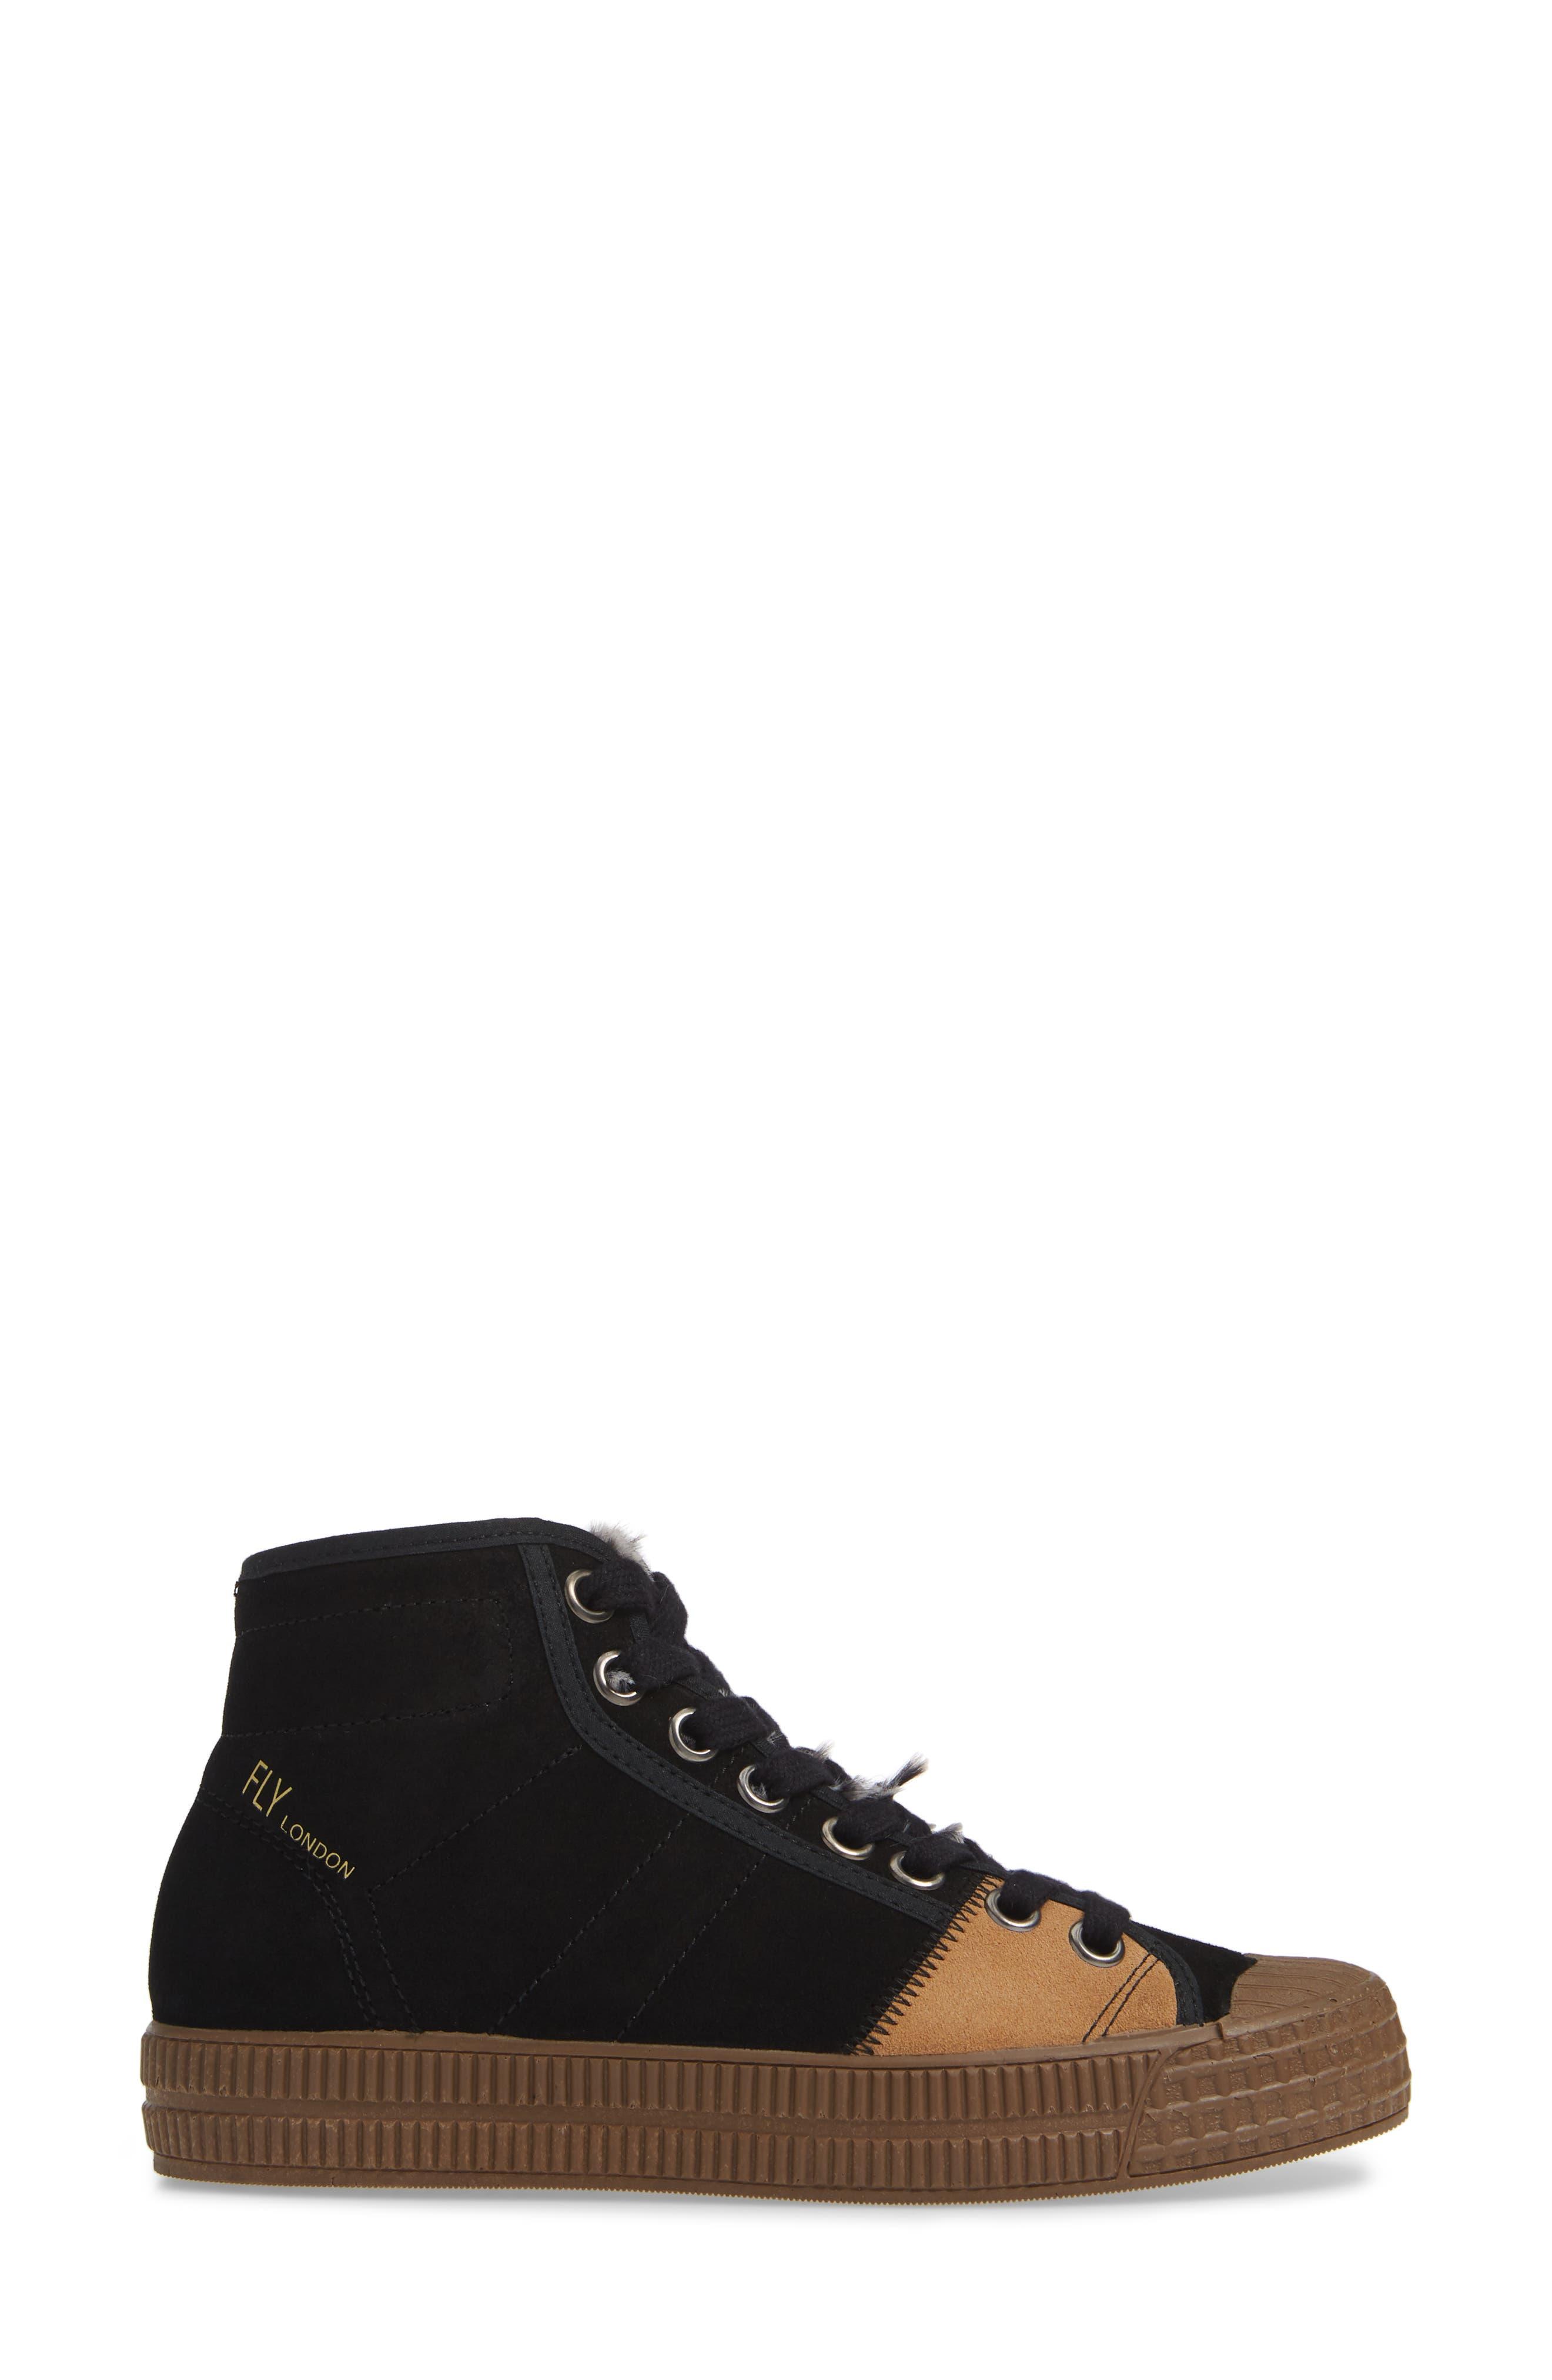 Femp High Top Sneaker,                             Alternate thumbnail 3, color,                             001